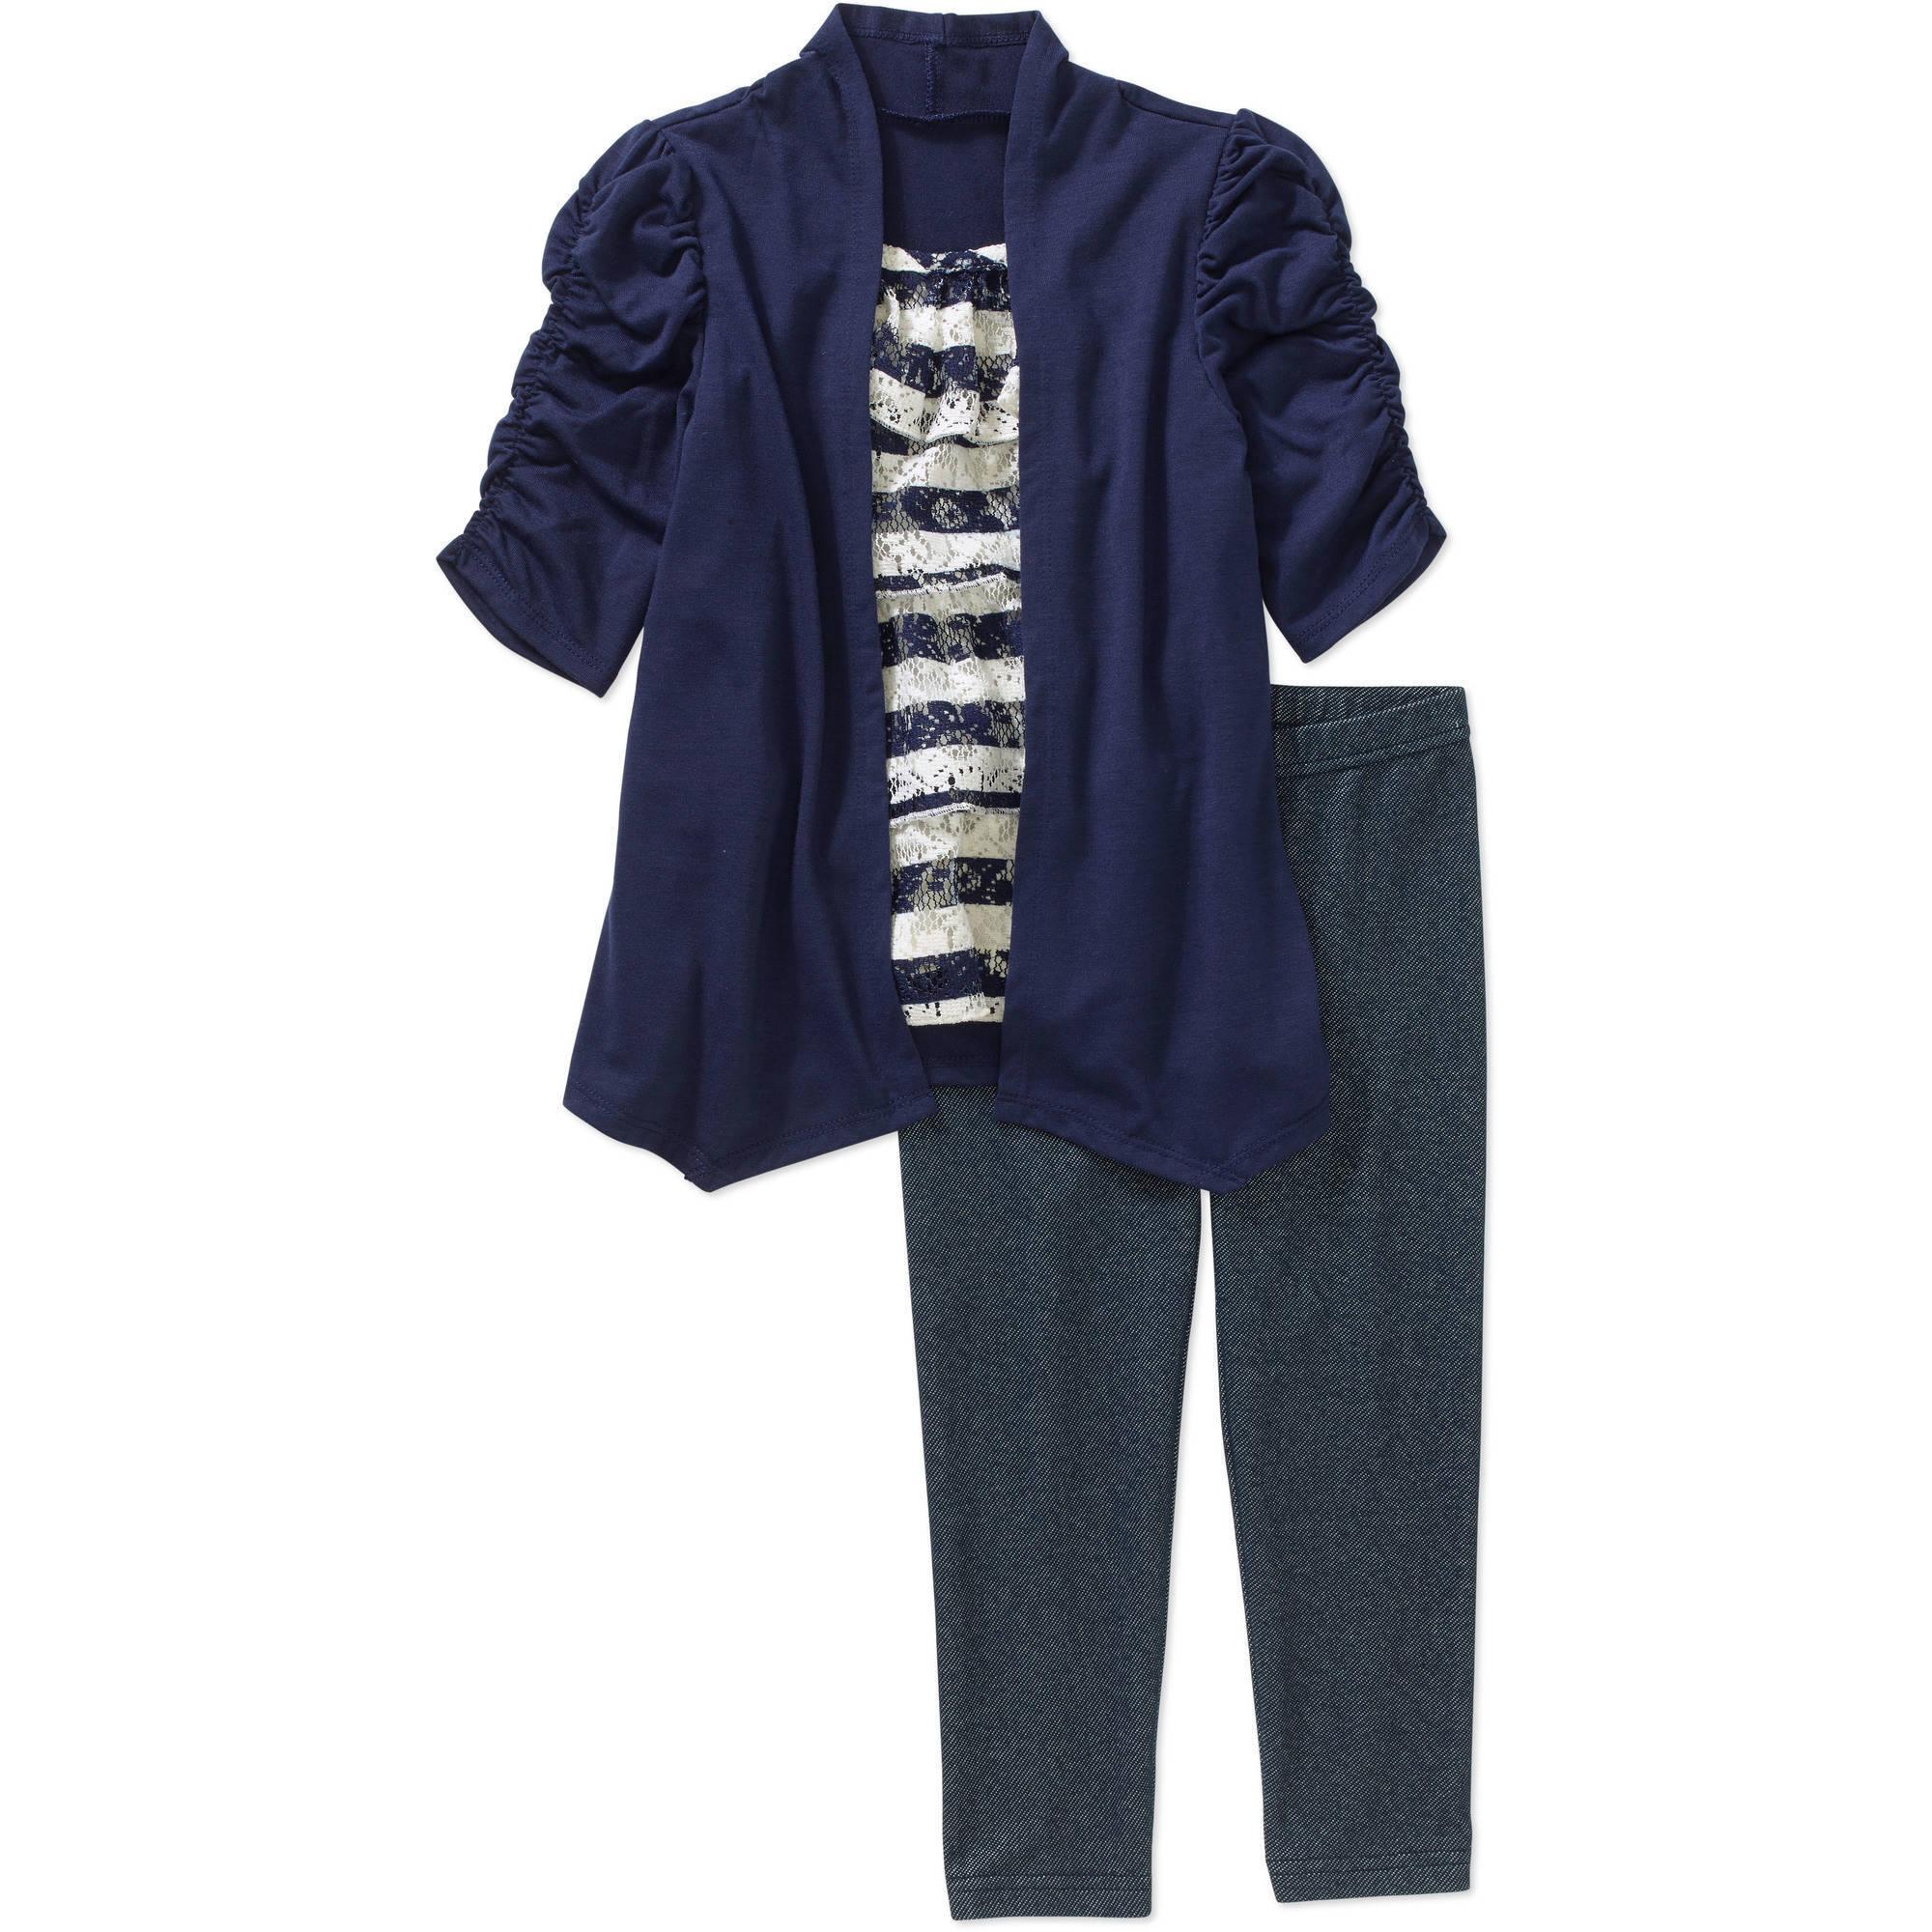 Healthtex Toddler Girls' Short Sleeve Hacci Layered Tunic and Knit Denim Leggings